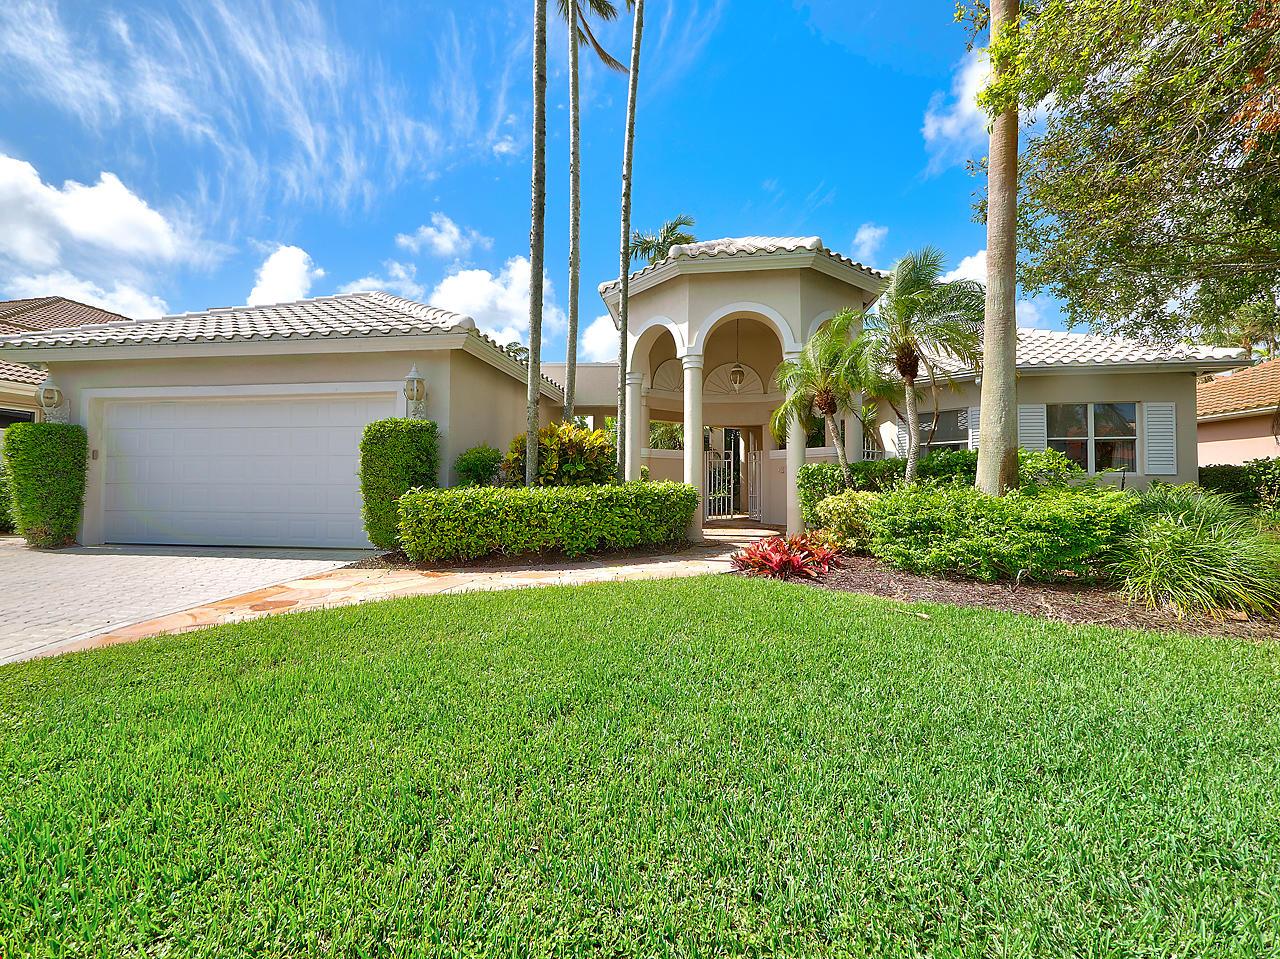 31 Saint James Drive Palm Beach Gardens,Florida 33418,3 Bedrooms Bedrooms,3.1 BathroomsBathrooms,A,Saint James,RX-10368205